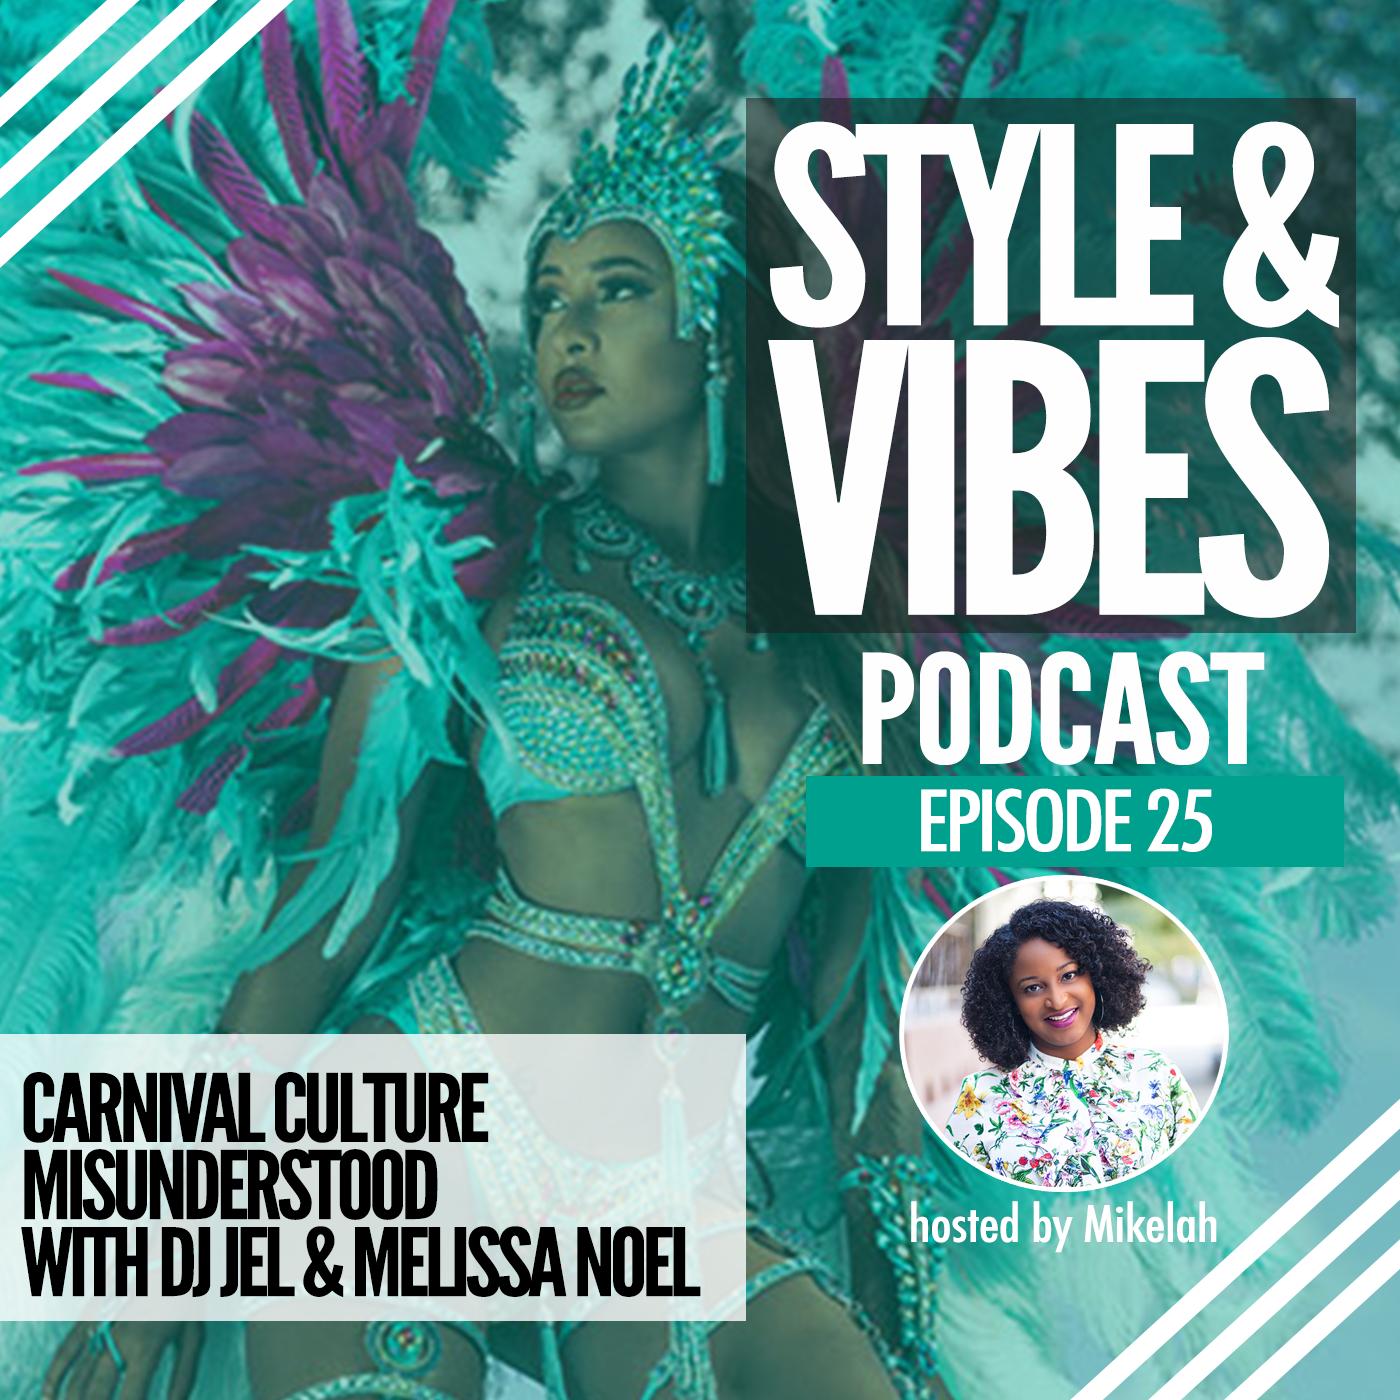 SV 25: Carnival Culture Misunderstood